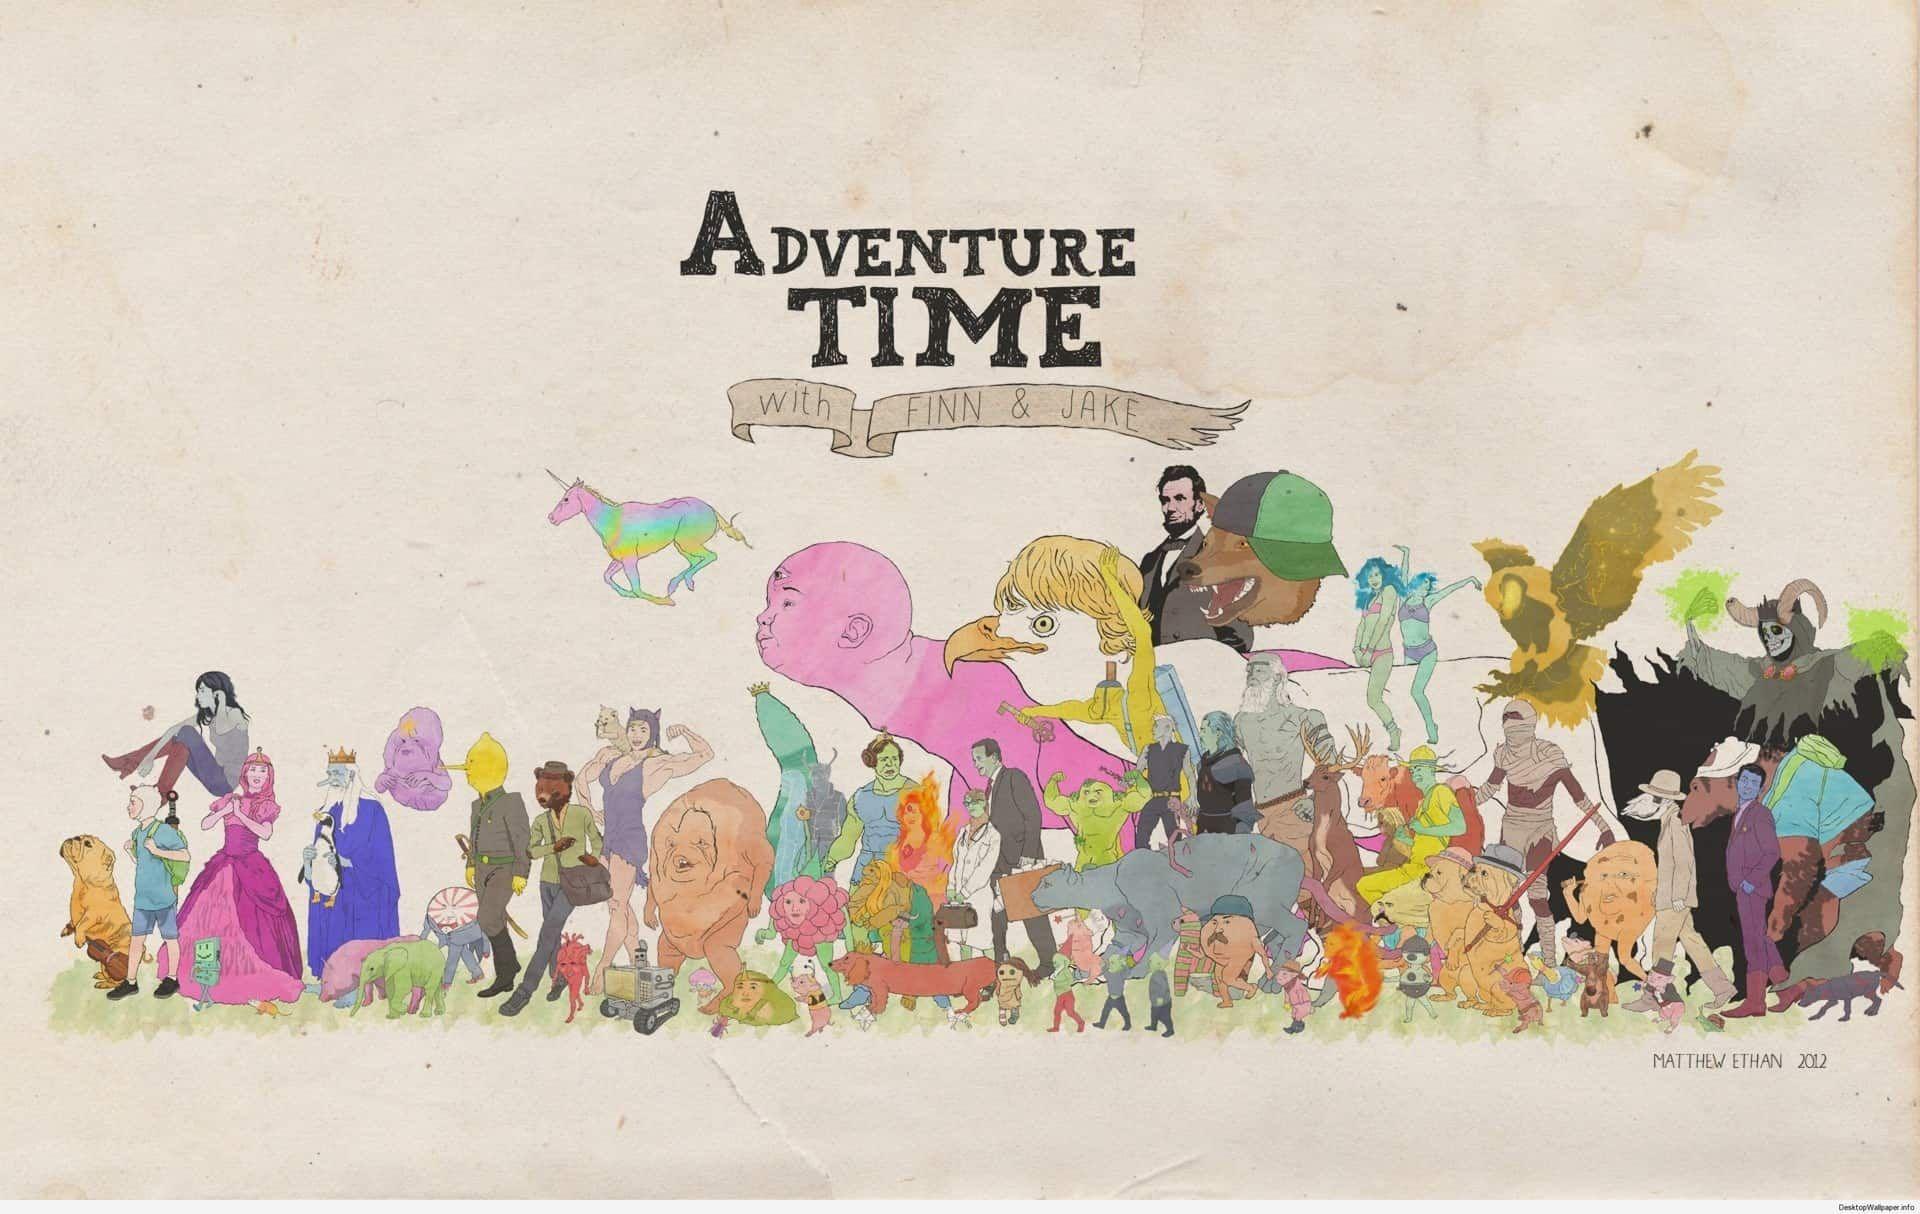 Adventure Time Wallpaper 4k Http Desktopwallpaper Info Adventure Time Wallpaper 4k 6478 Adventure Time Wallpaper Adventure Time Poster Adventure Time Anime